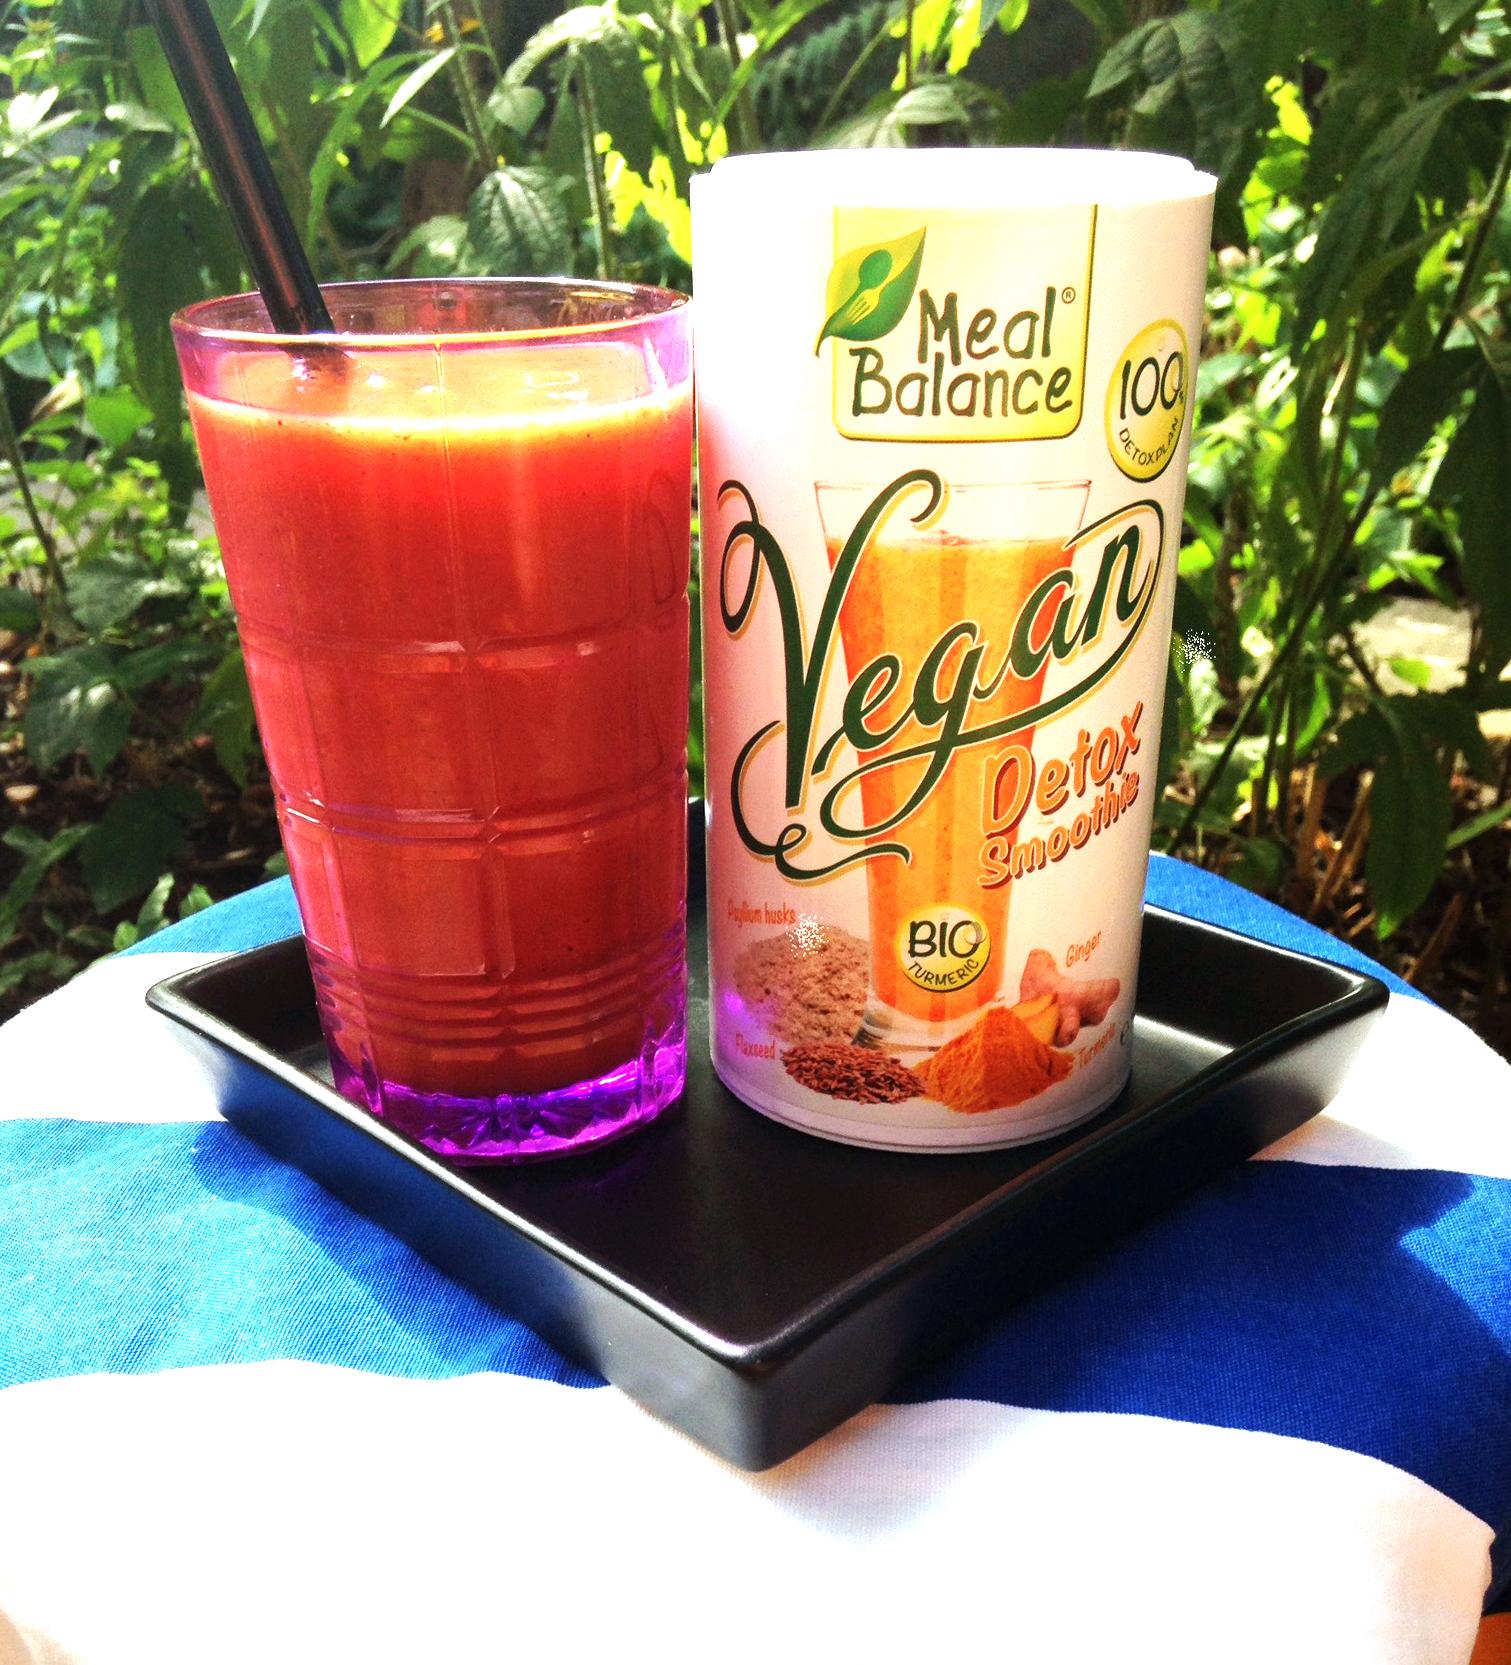 Smoothie Vegan - Detox Smoothie Meal Balance® - Life Care